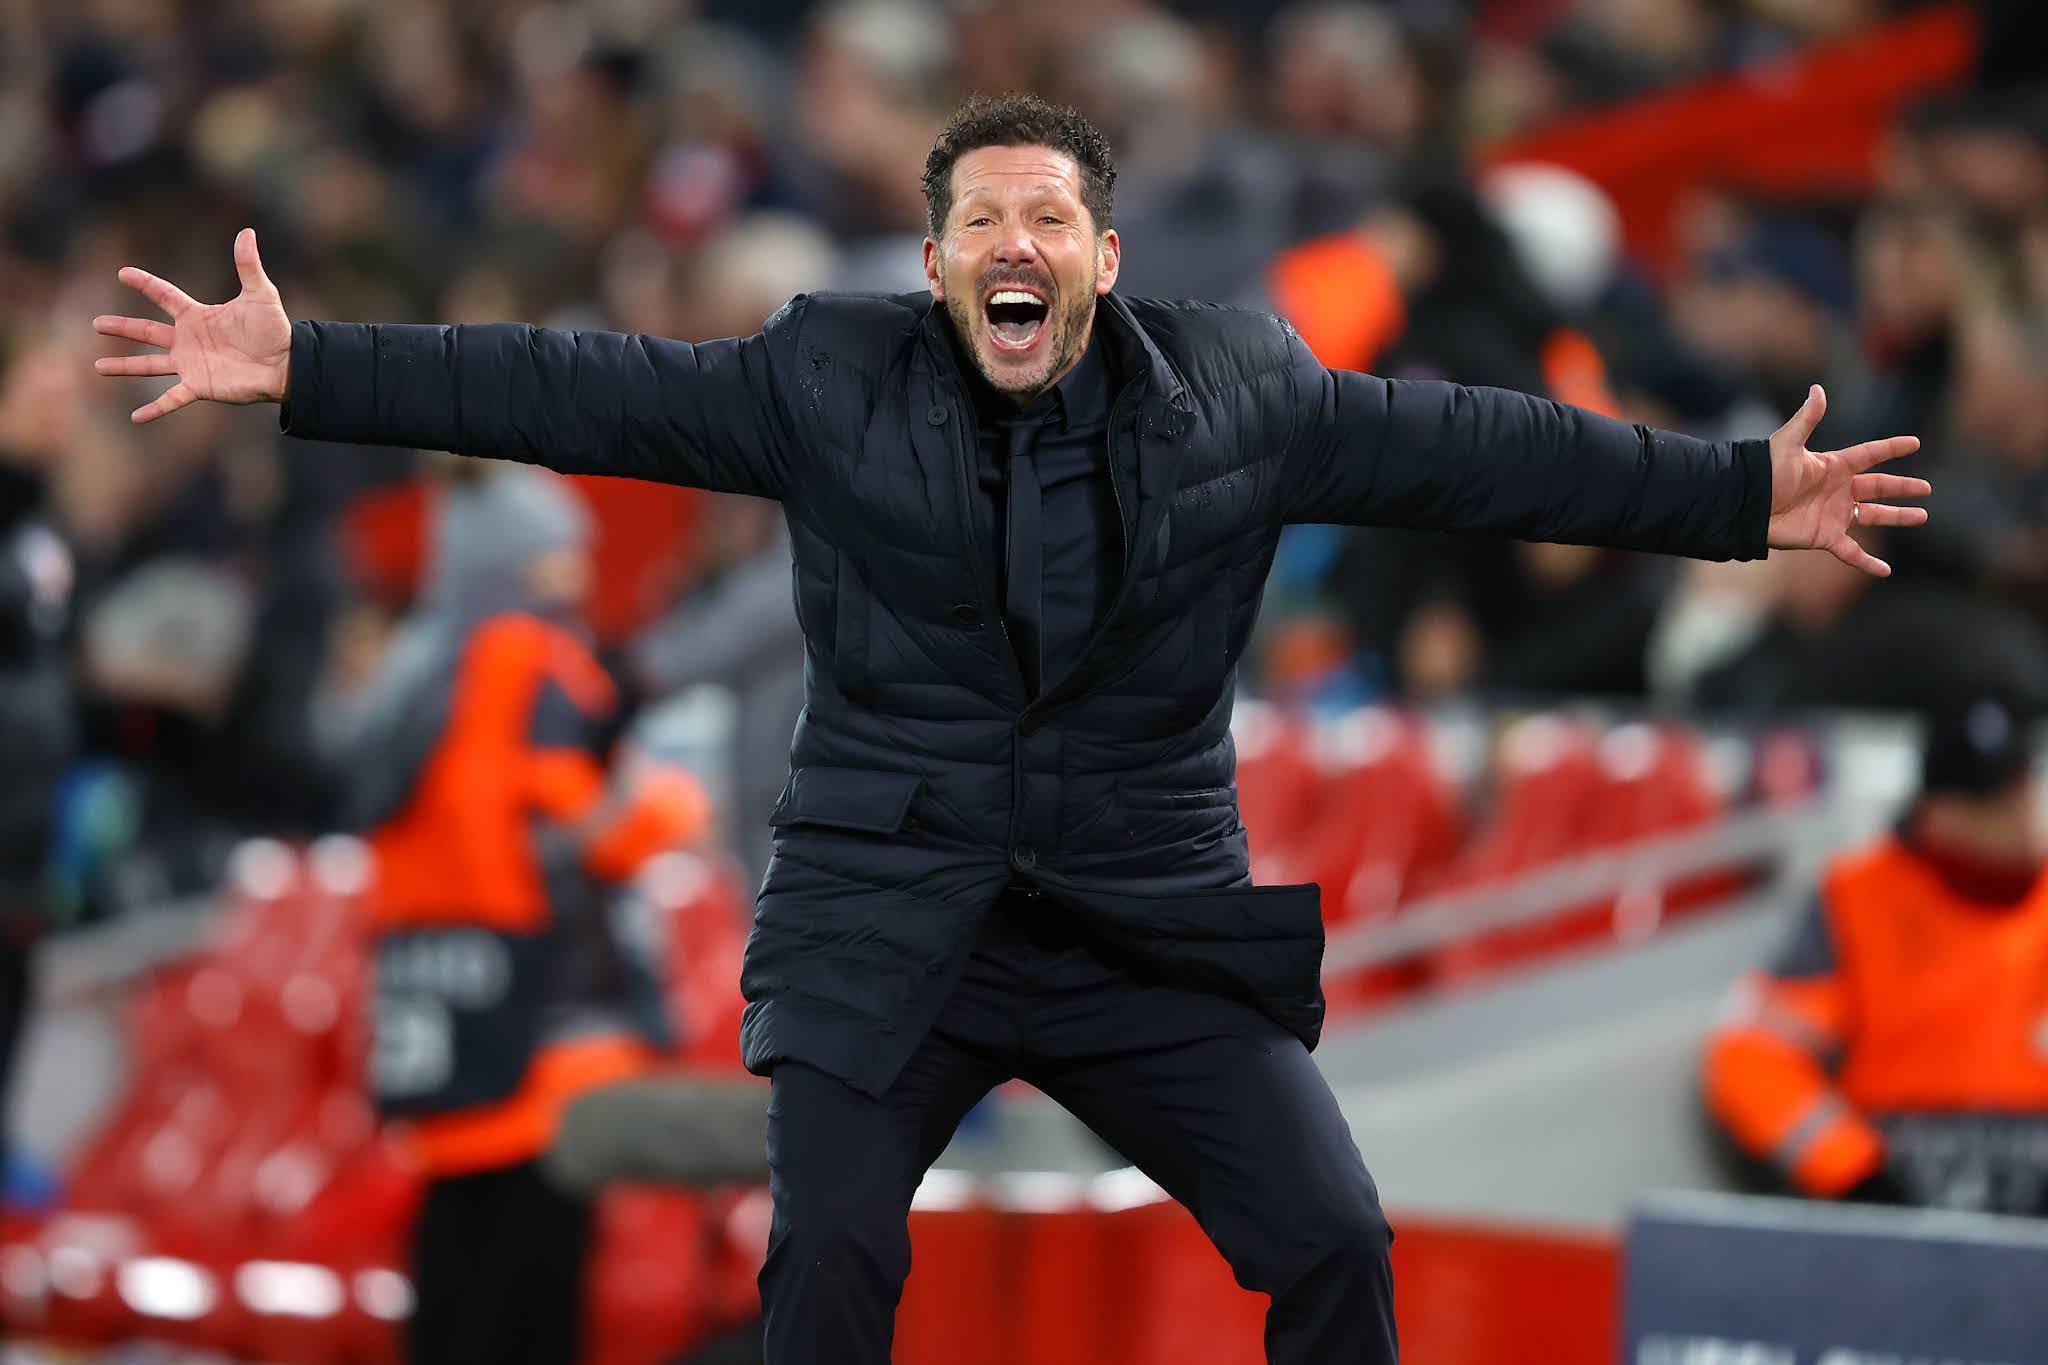 Atletico Madrid manager Diego Simeone